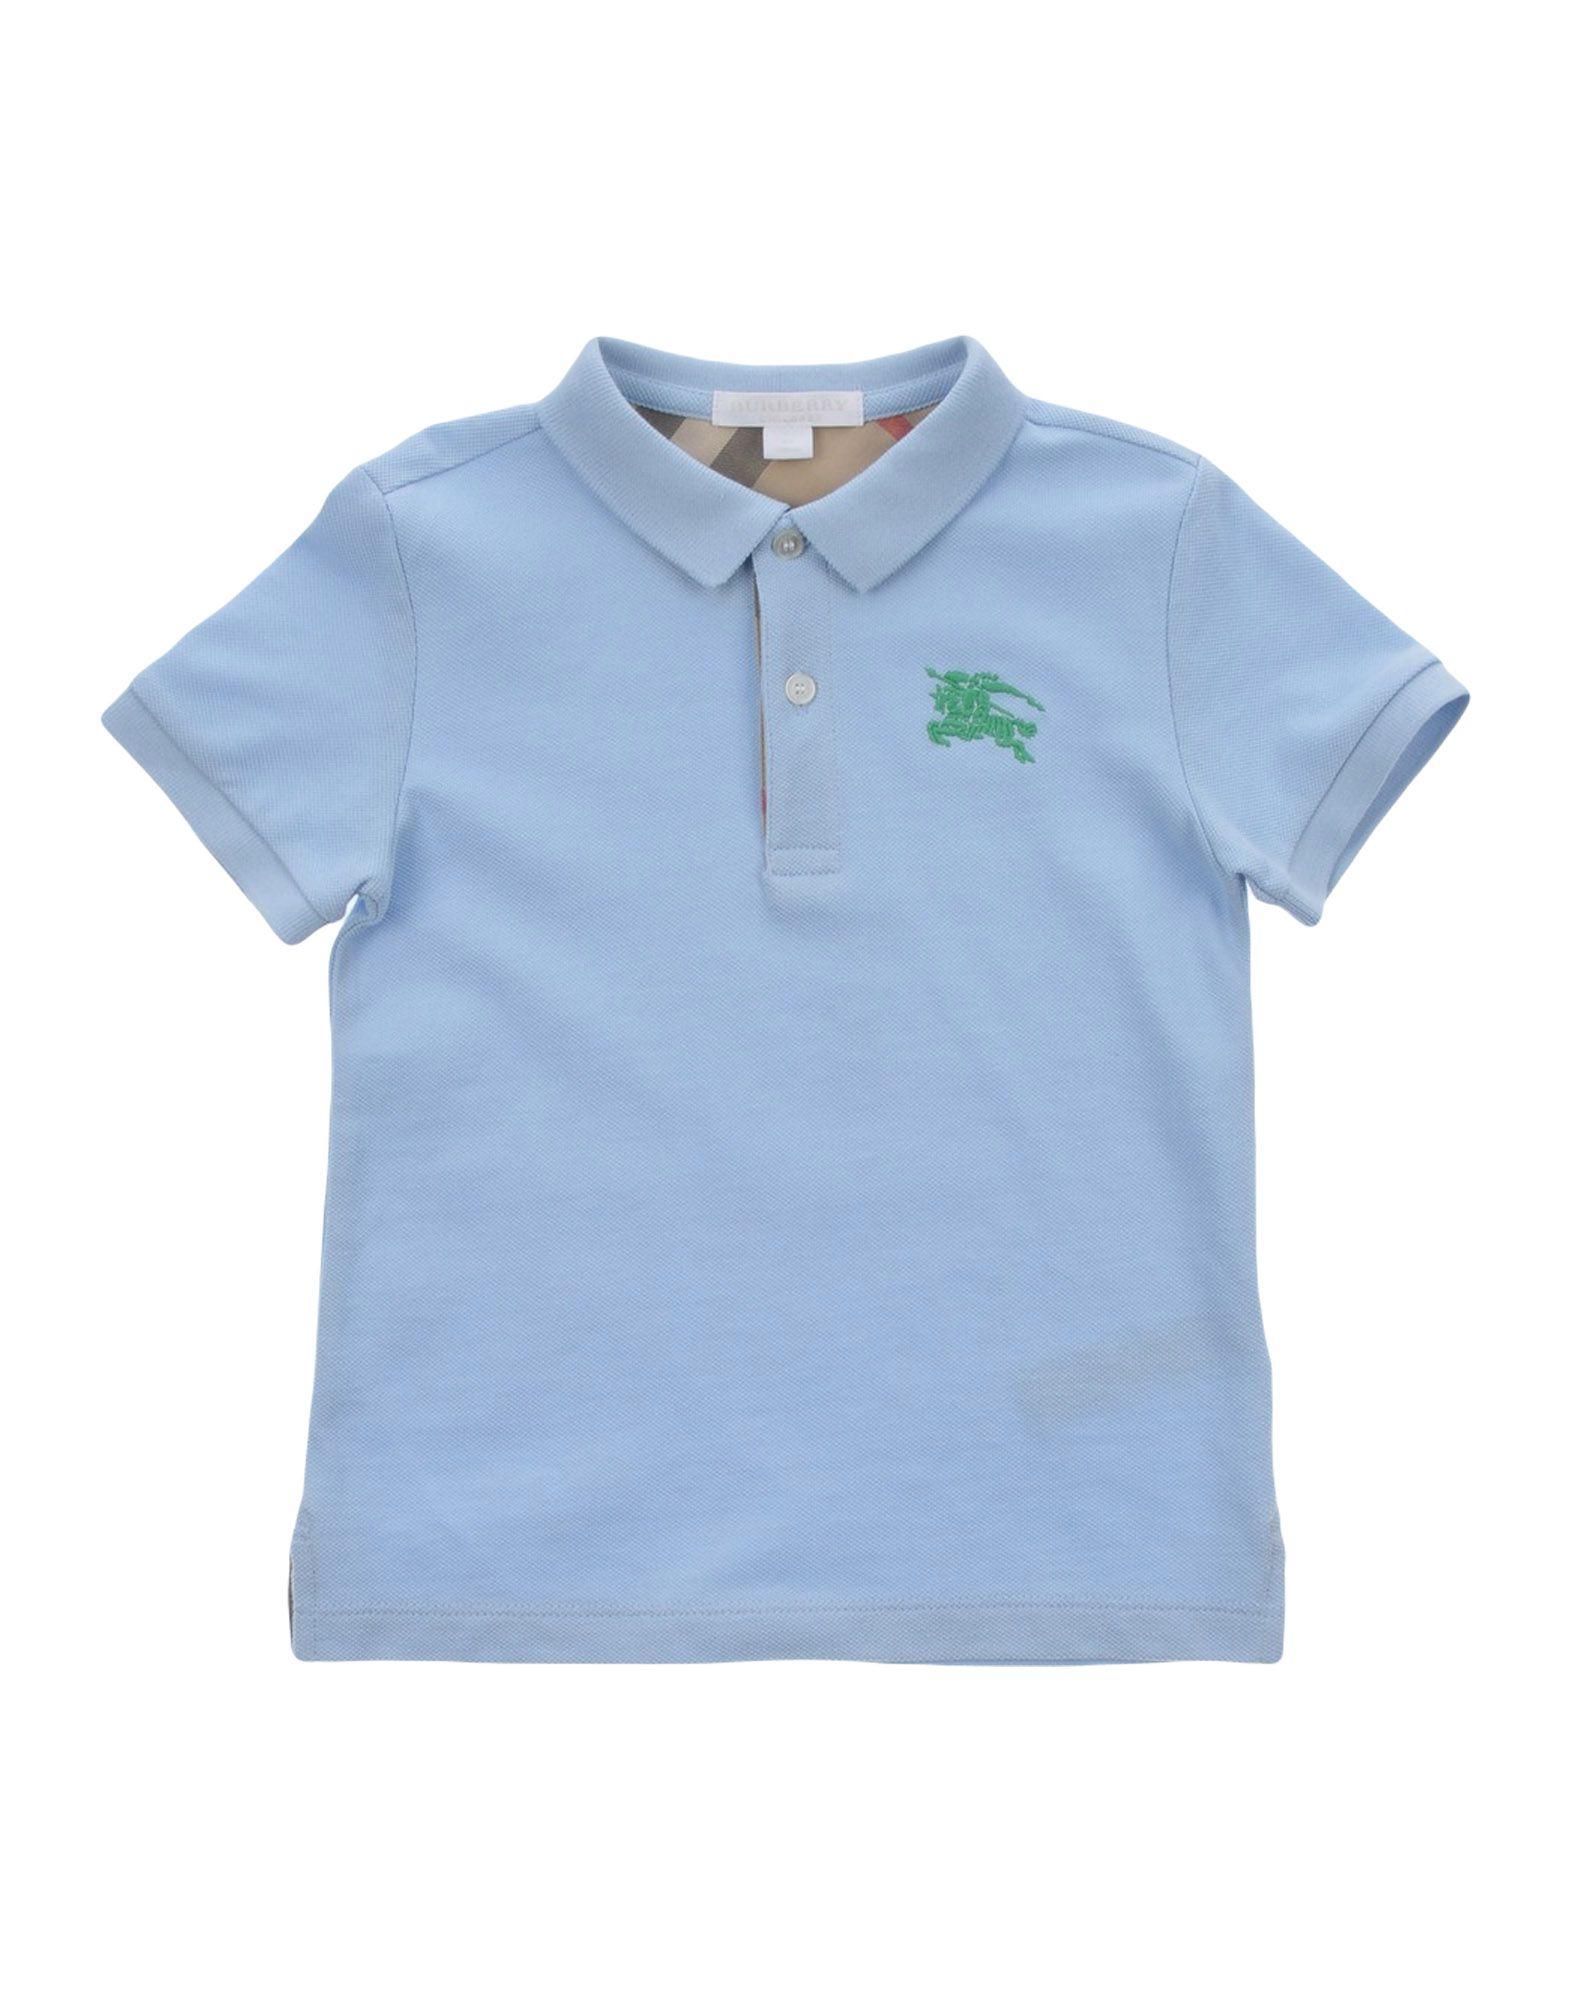 Burberry Polo Shirt Boy 3 8 Years Online On Yoox Hong Kong